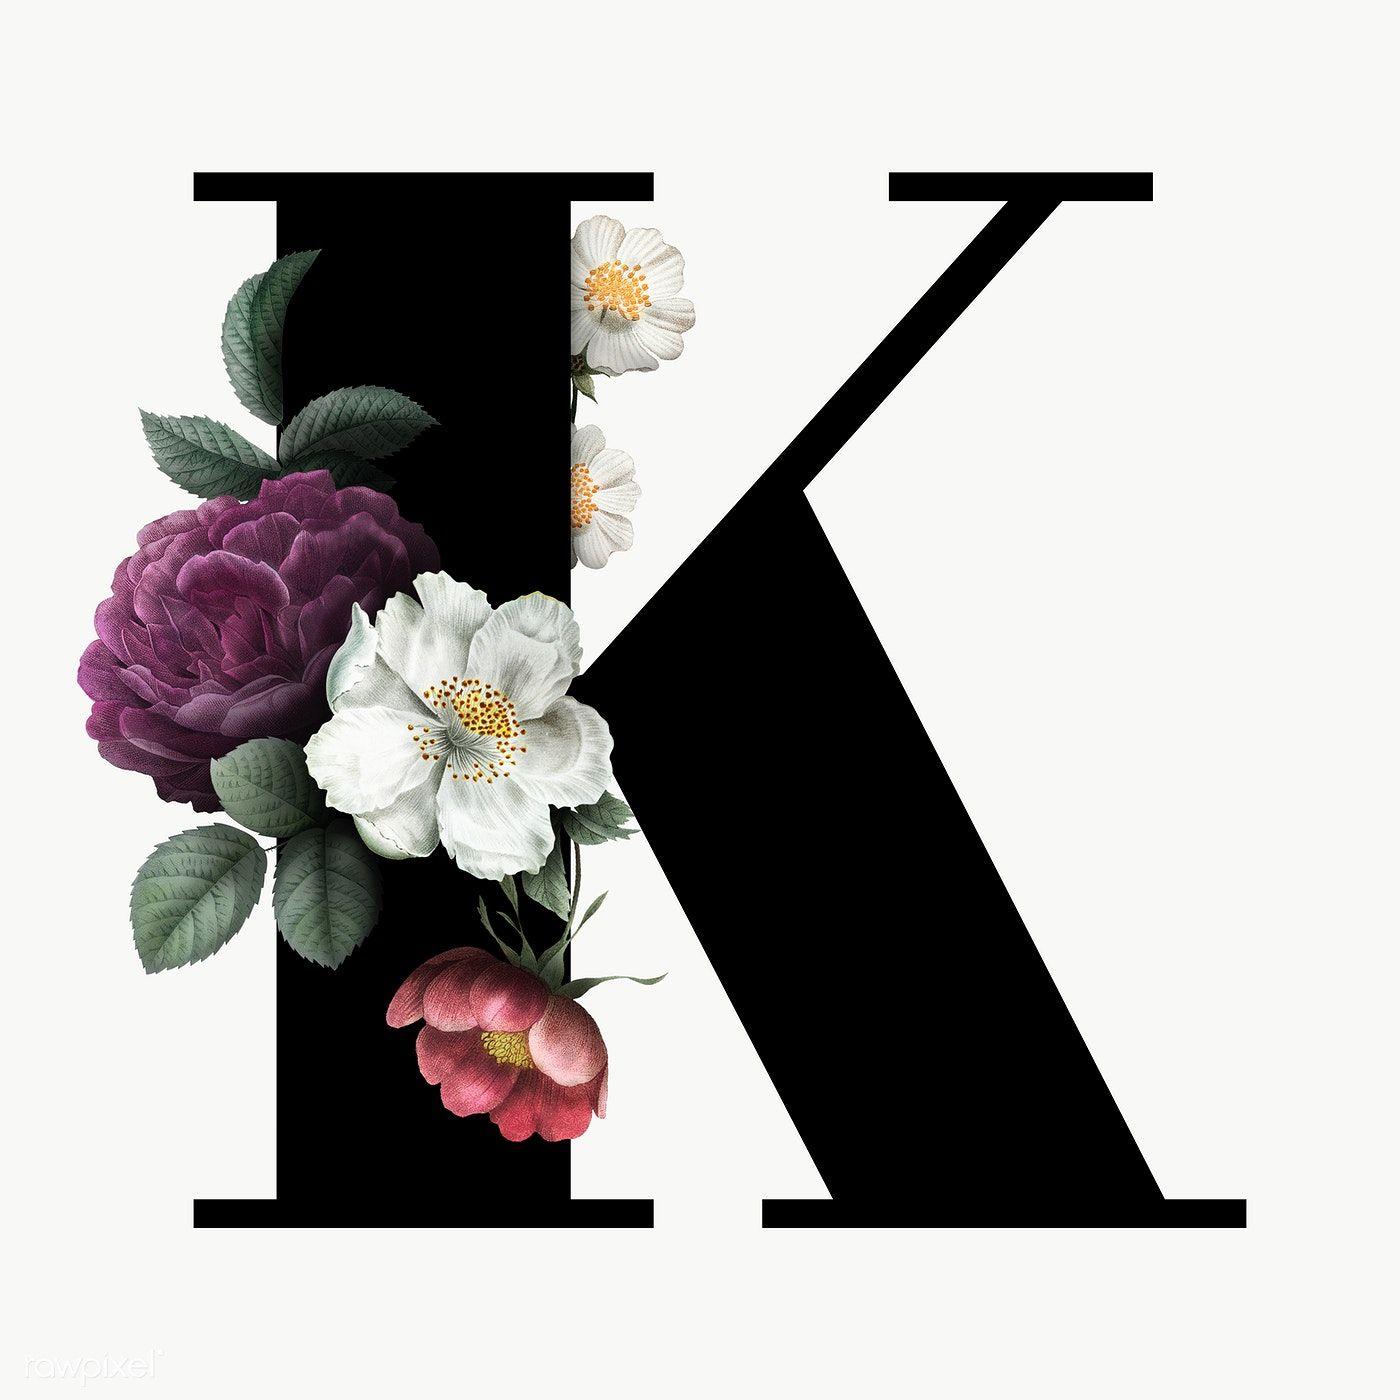 Classic And Elegant Floral Alphabet Font Letter K Transparent Png Free Image By Rawpixel Com Manota Lettering Alphabet Fonts Fonts Alphabet Lettering Fonts